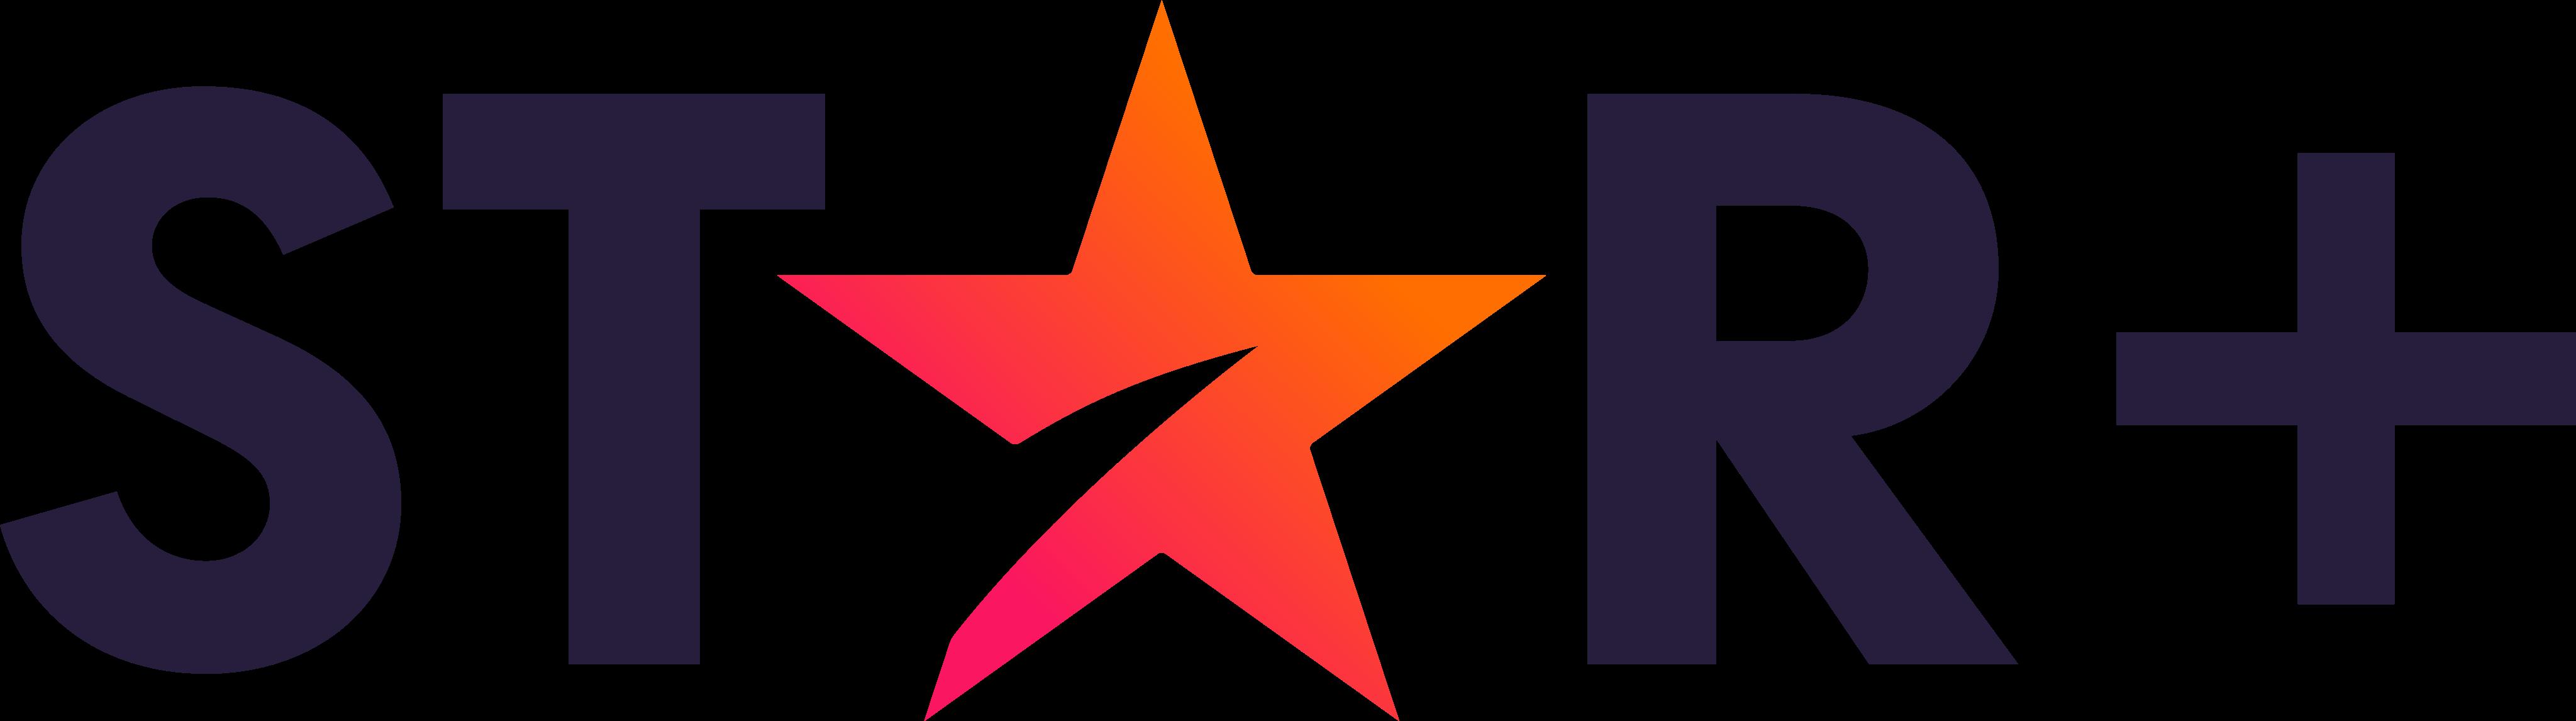 star plus logo - Star+ Logo